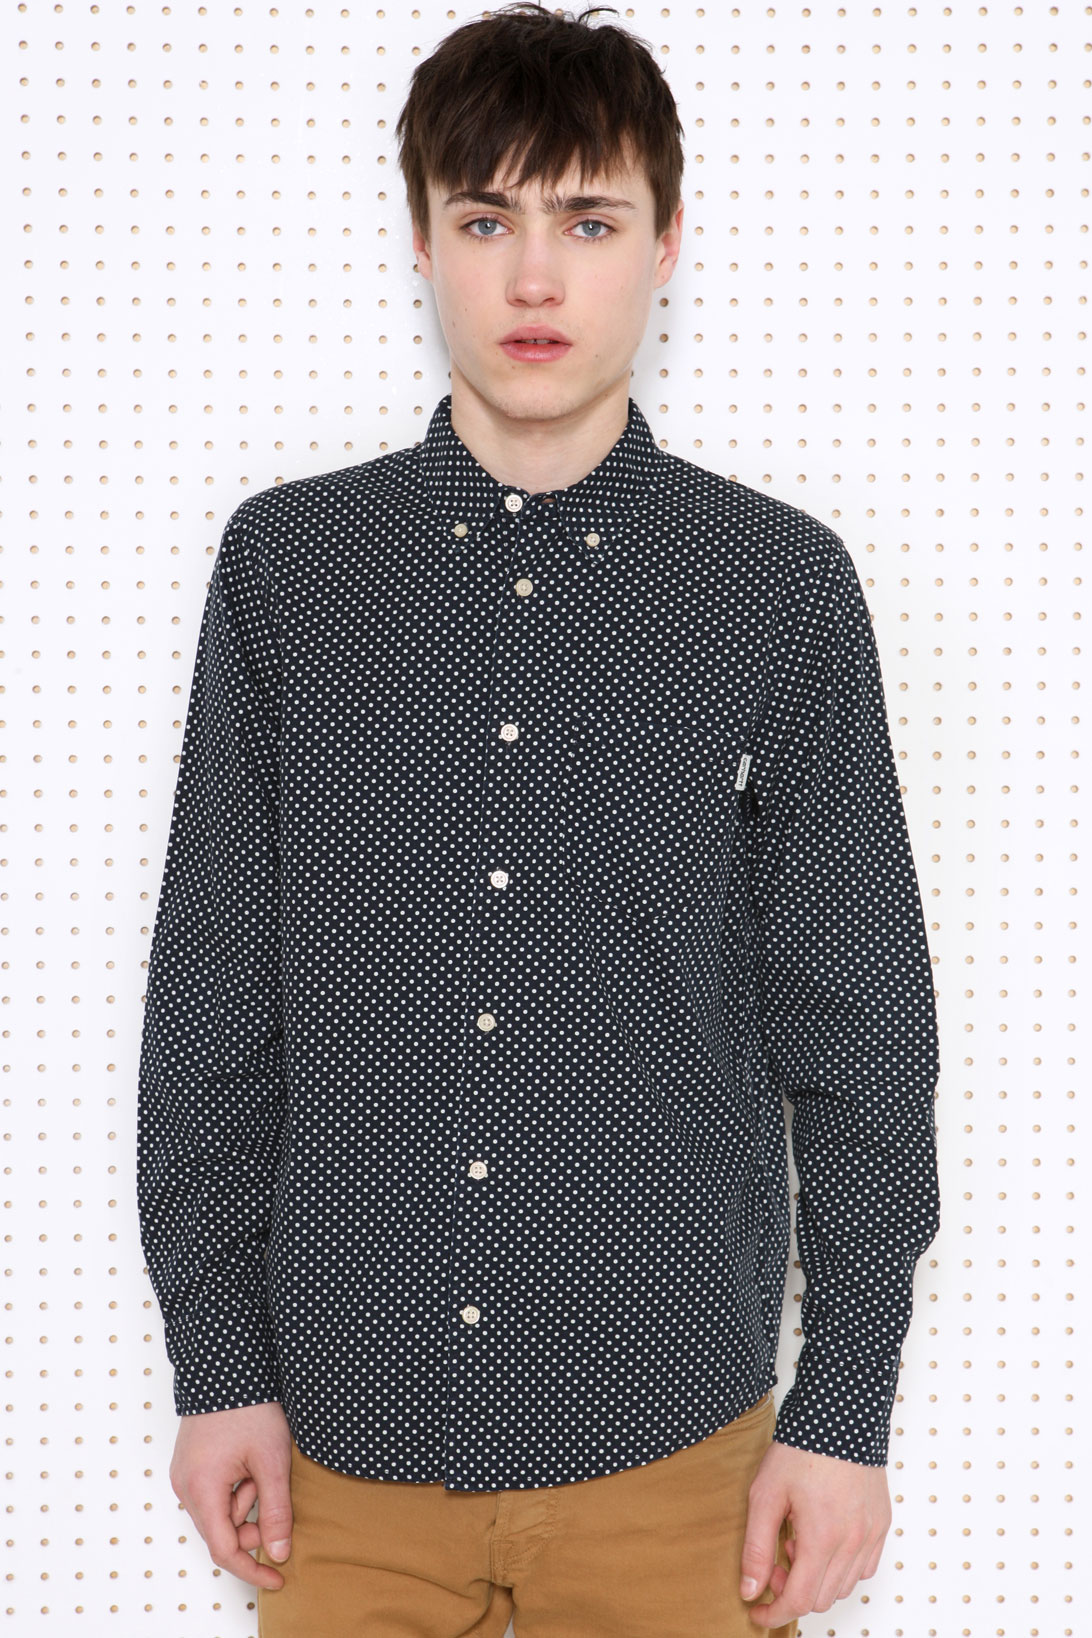 Carhartt-chemise-bleu-blanc-lecatalog.com